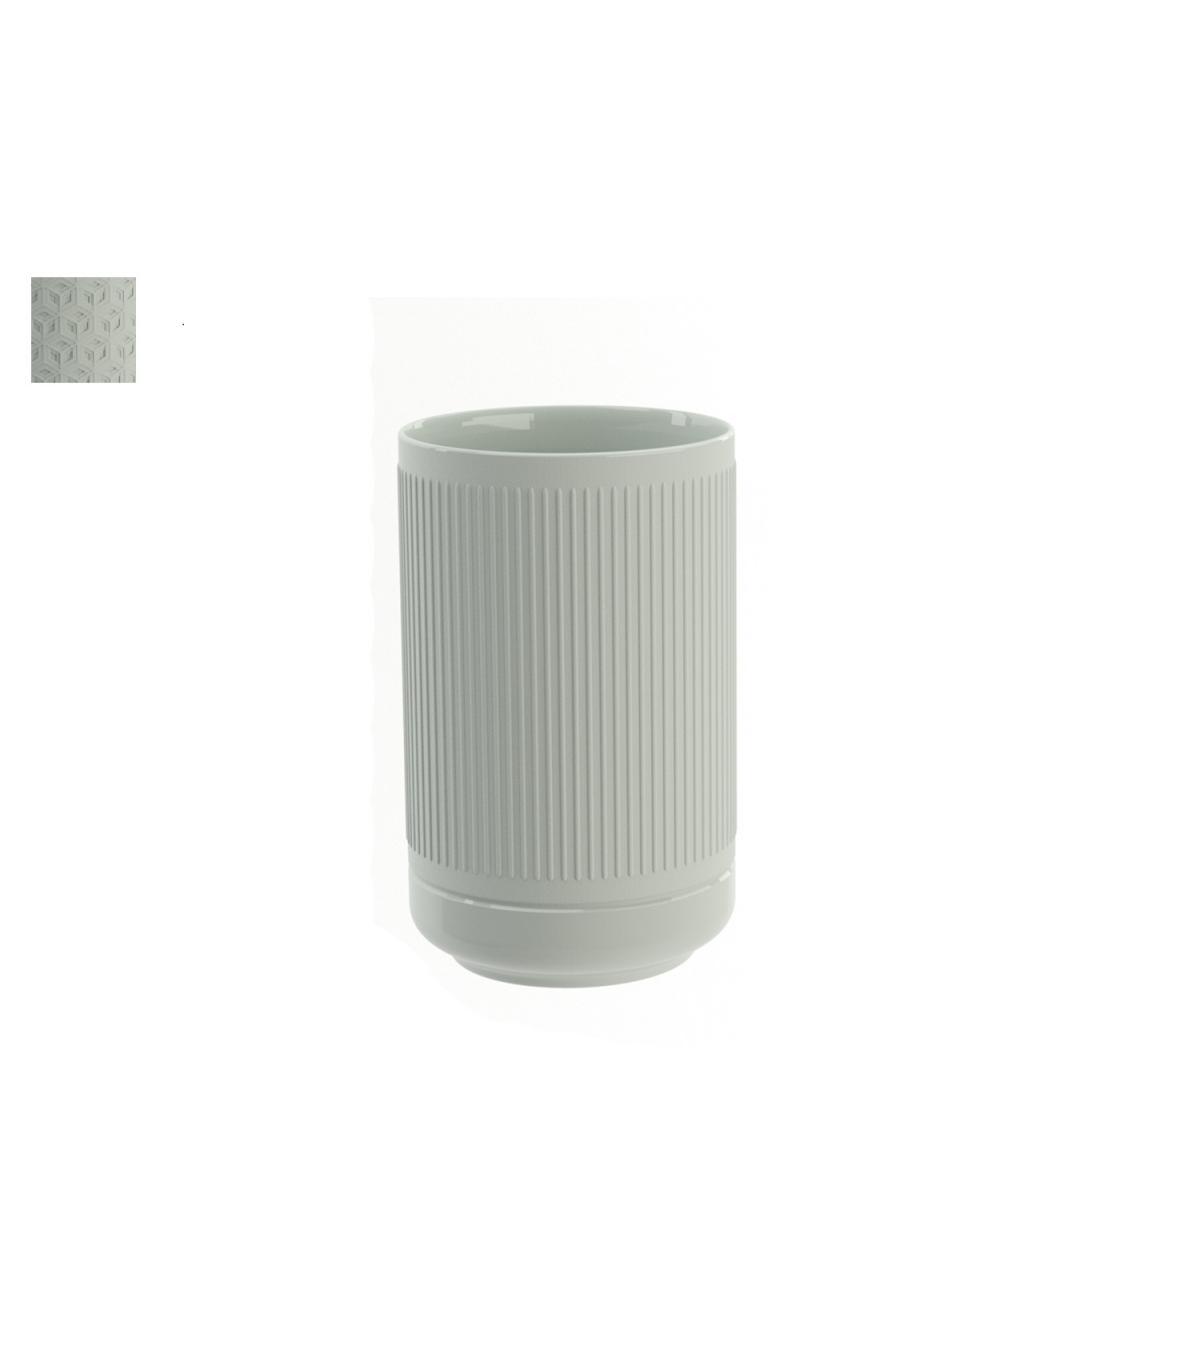 porta saloon doccia Jolly Inda